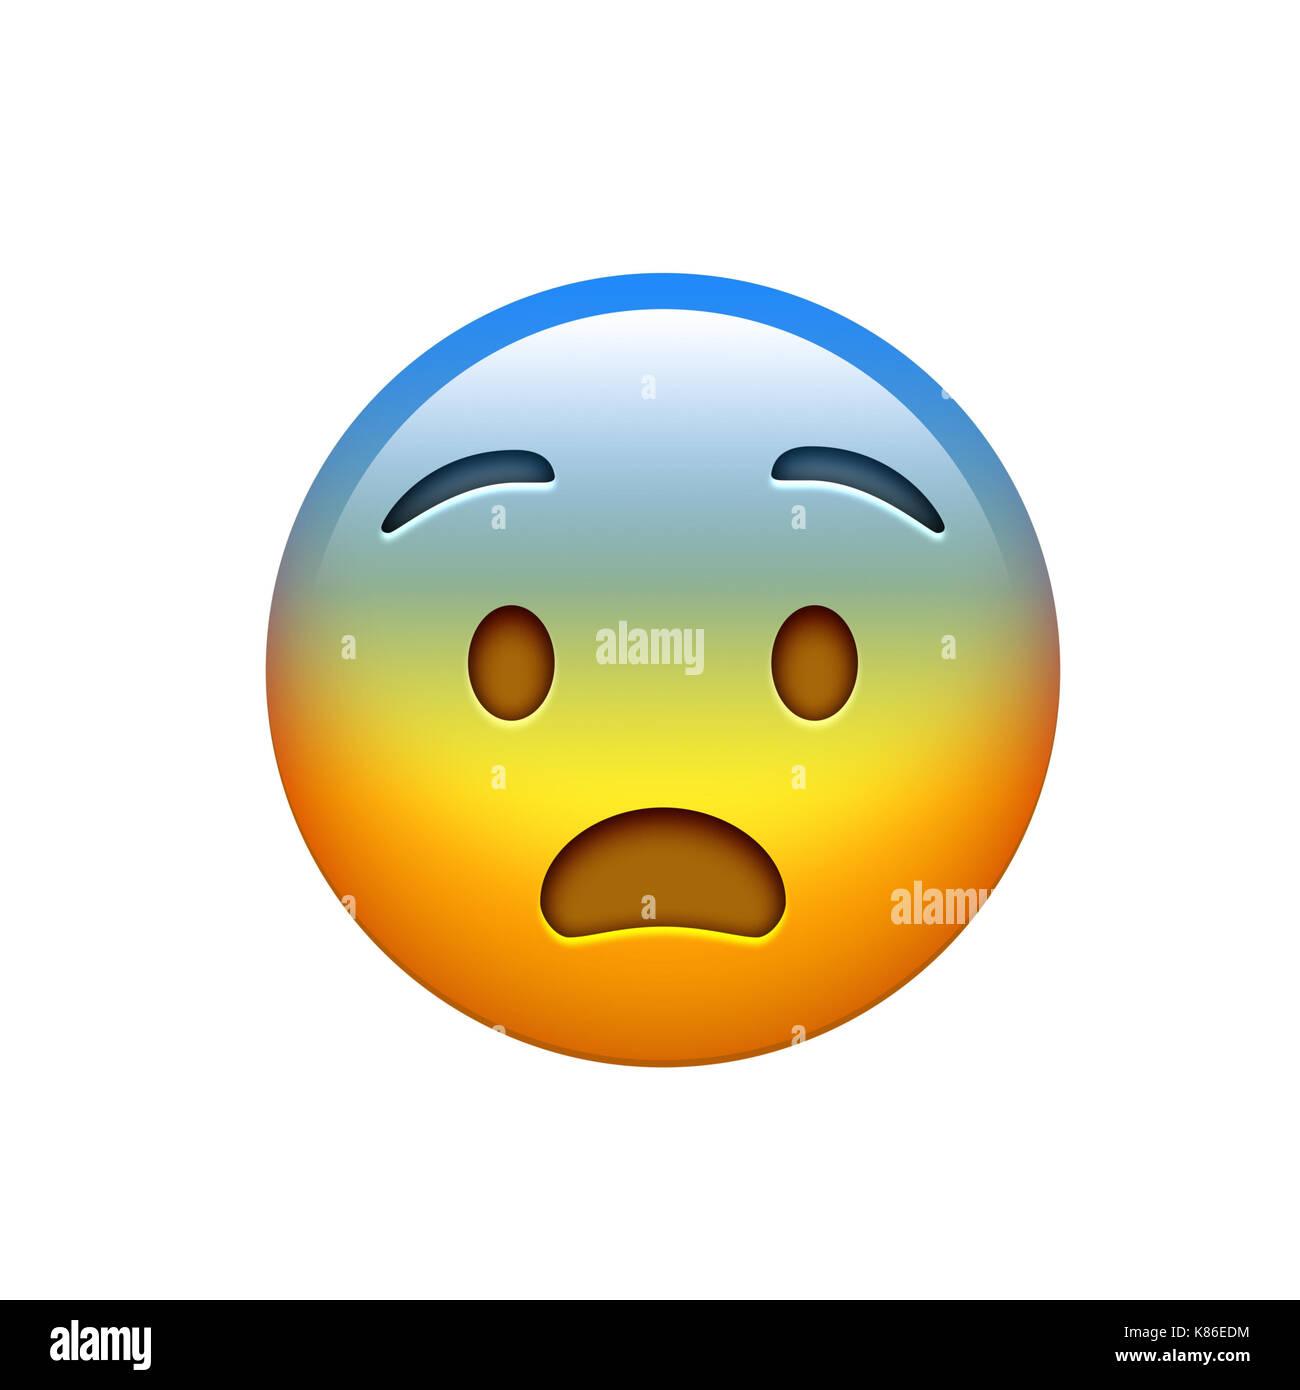 The emoji yellow headache spooky face icon - Stock Image